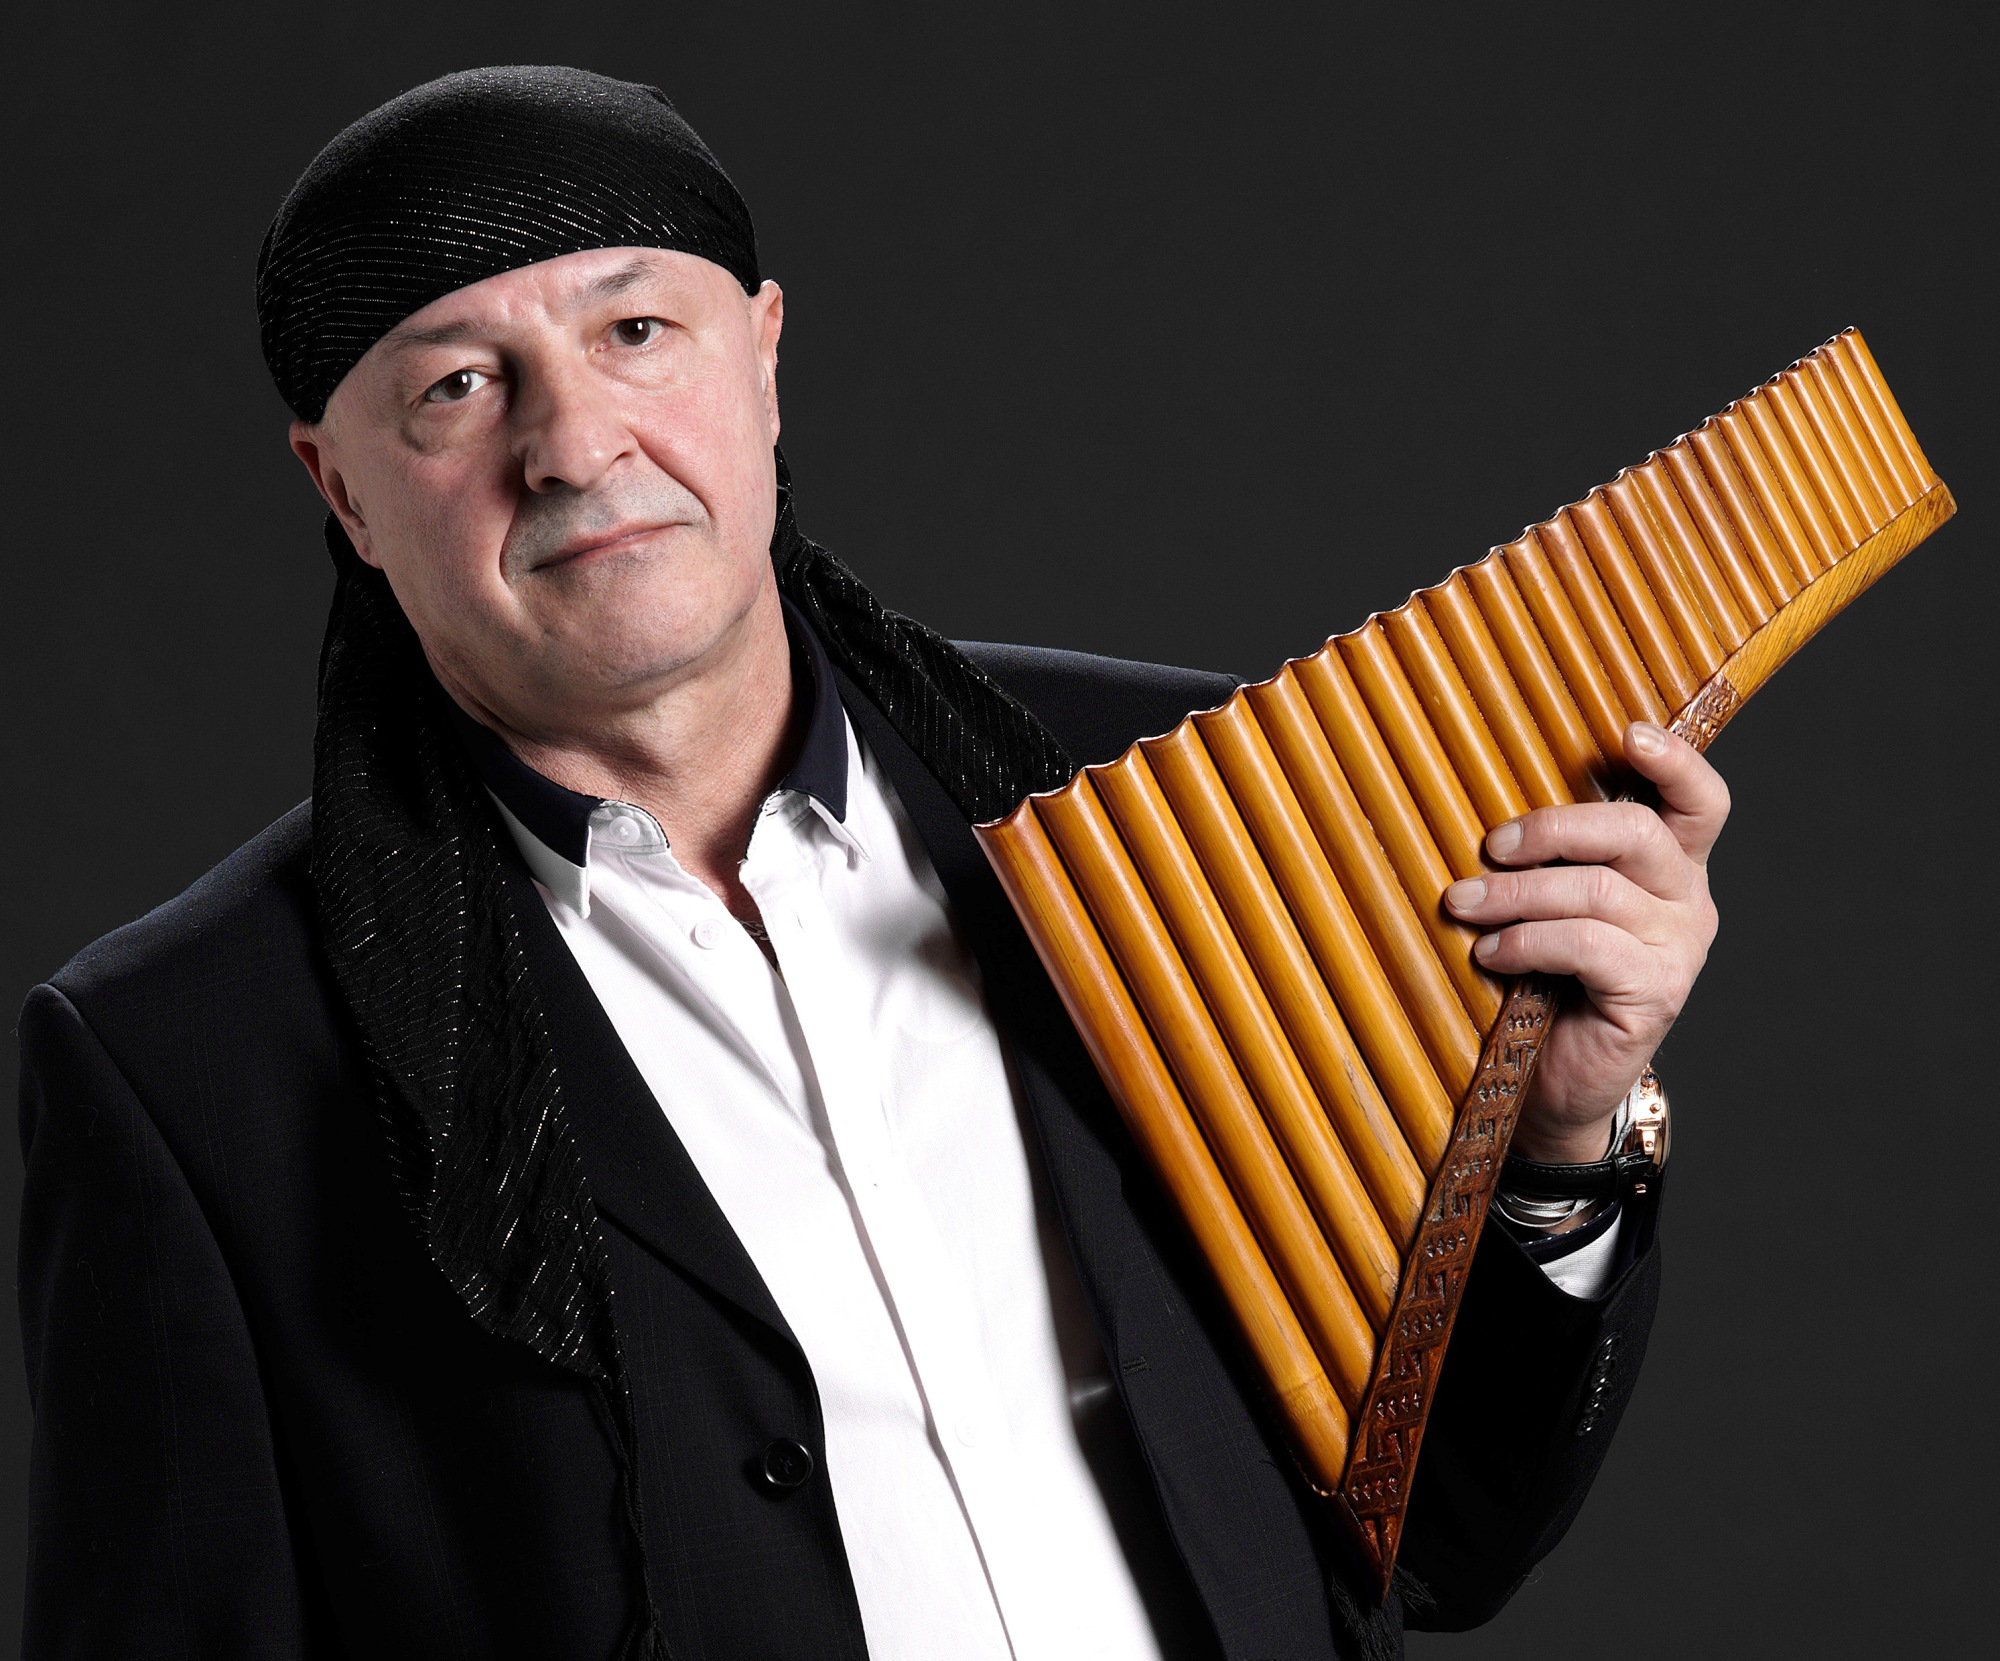 """ADVENTRE HANGOLVA"" - Kegye János ünnepi pánsíp koncertje"